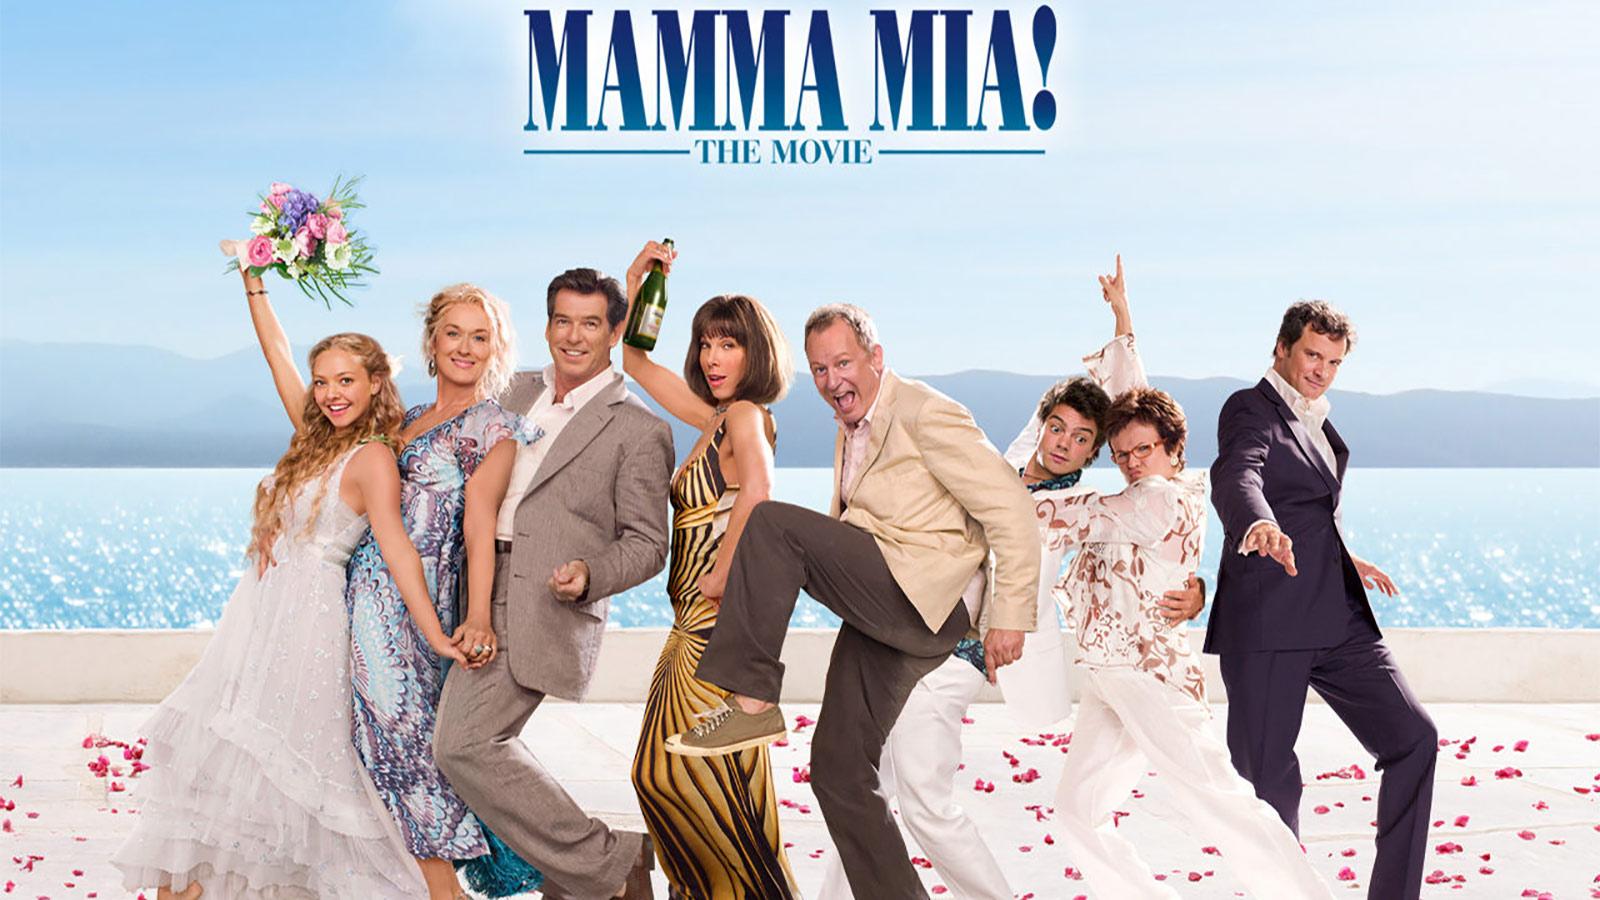 Mamma Mia Palm Springs International Film Festival - Palm springs escort reviews